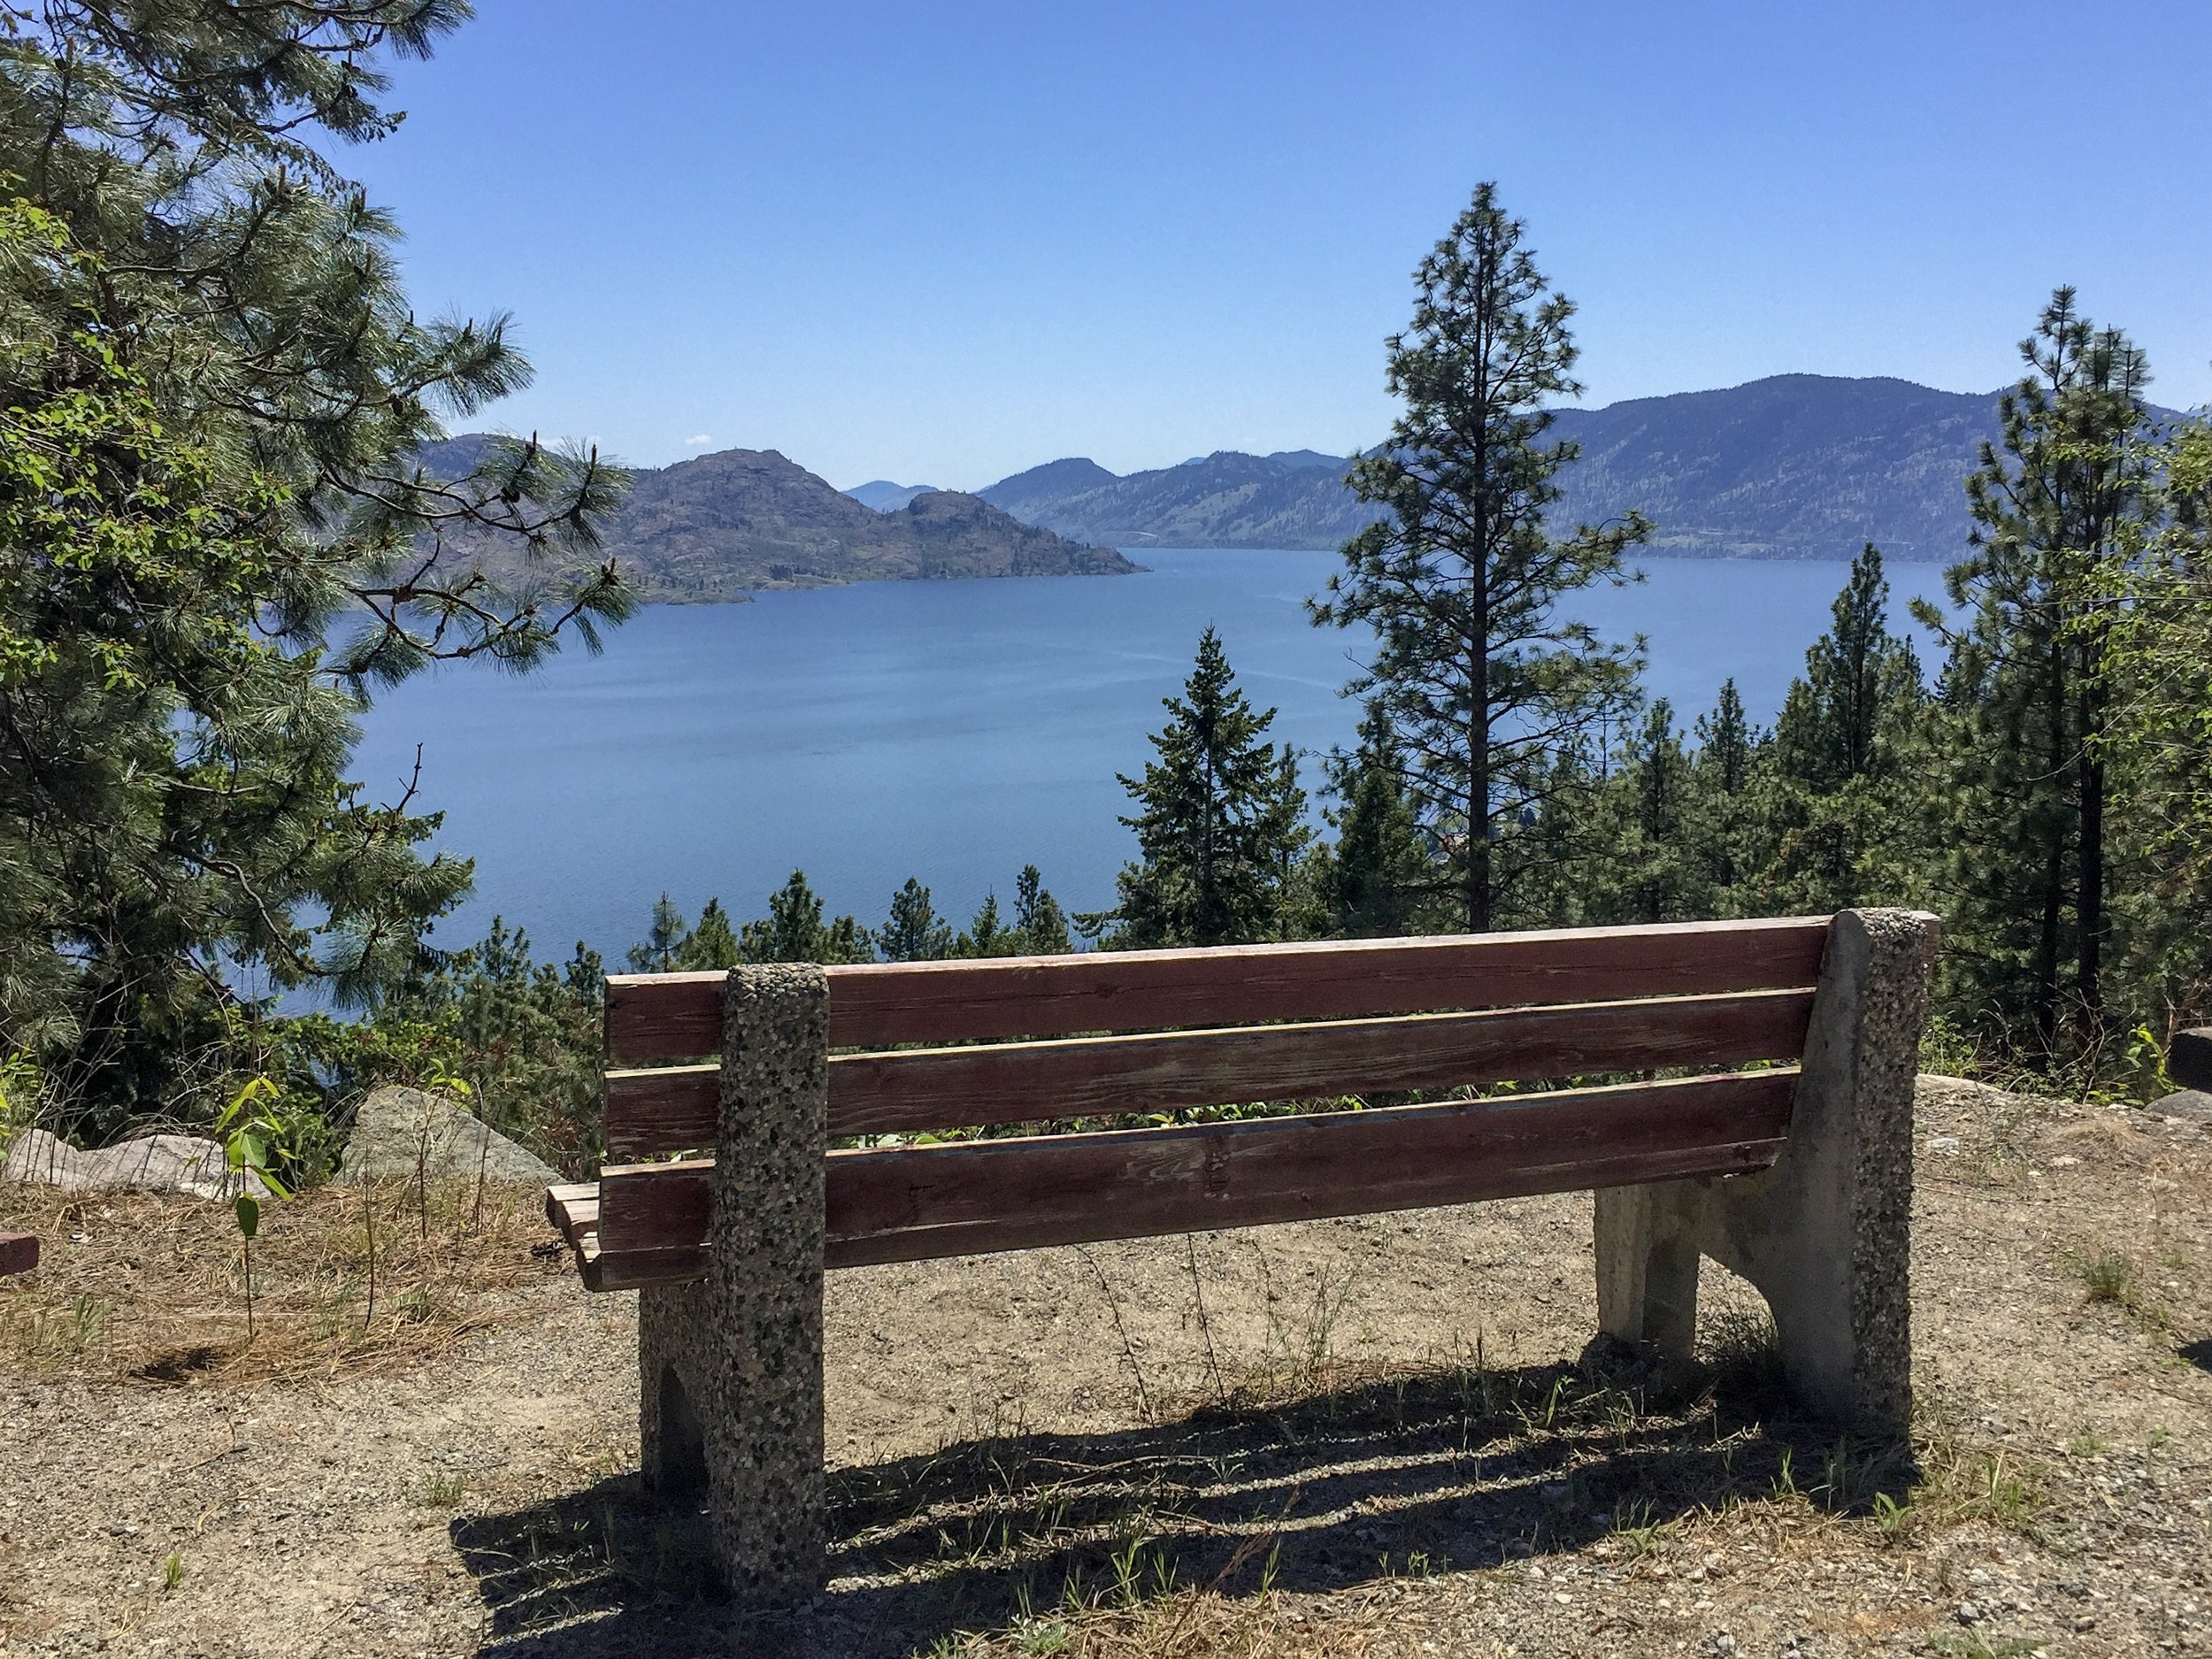 bench-ponderosa-neighbourhood-peachland-joshua-elliott.JPG